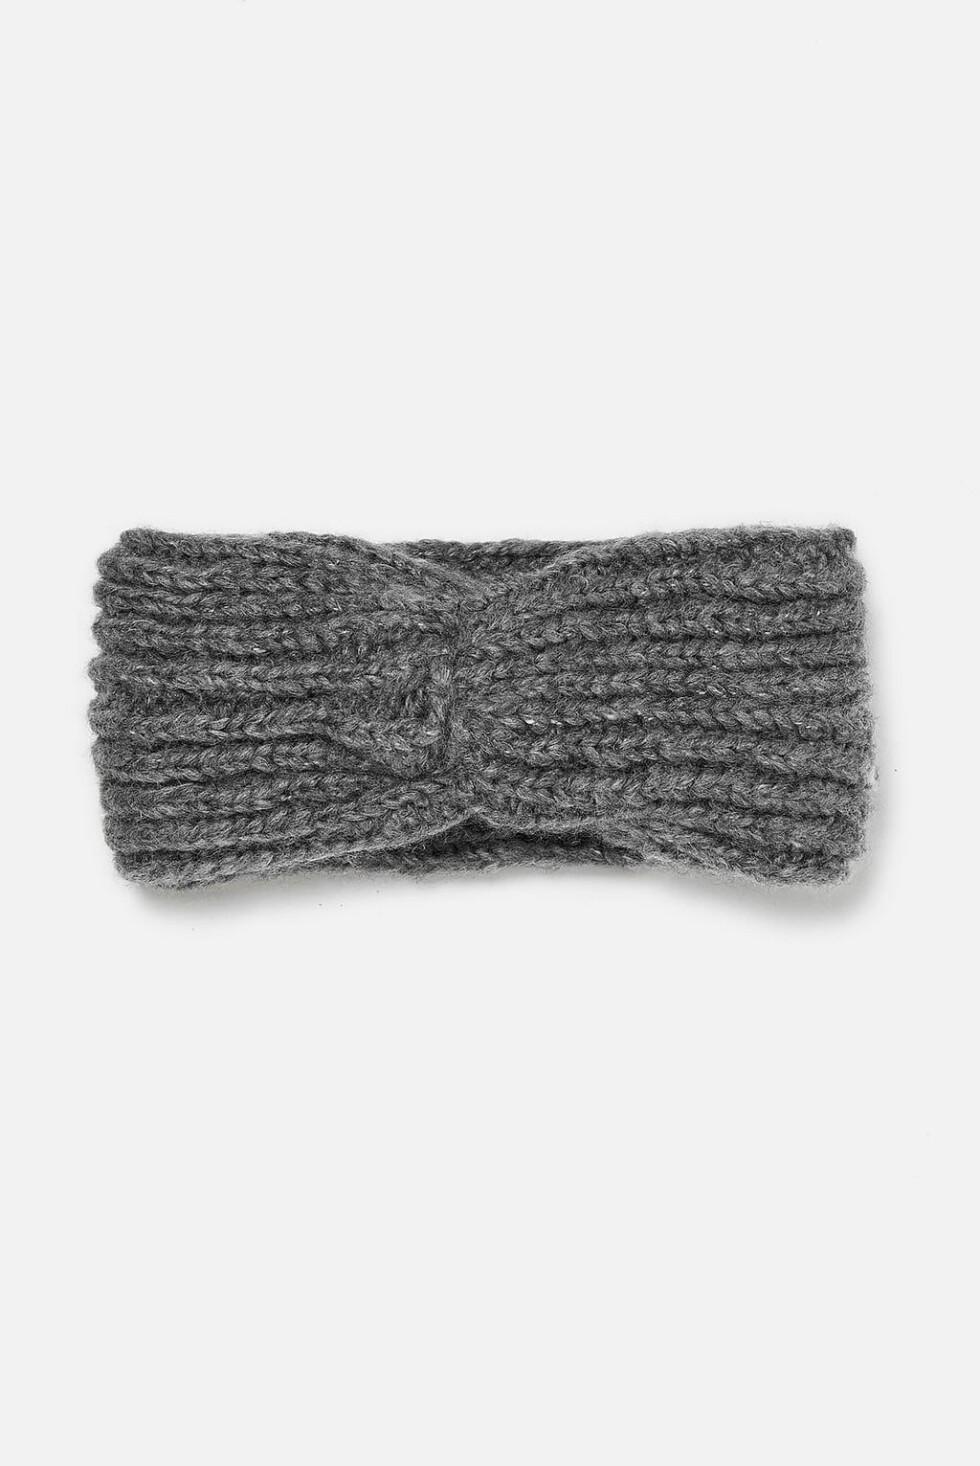 Pannebånd fra Zara  130,-  https://www.zara.com/no/no/strikket-turban-h%C3%A5rb%C3%A5nd-p06771202.html?v1=7192109&v2=1074577